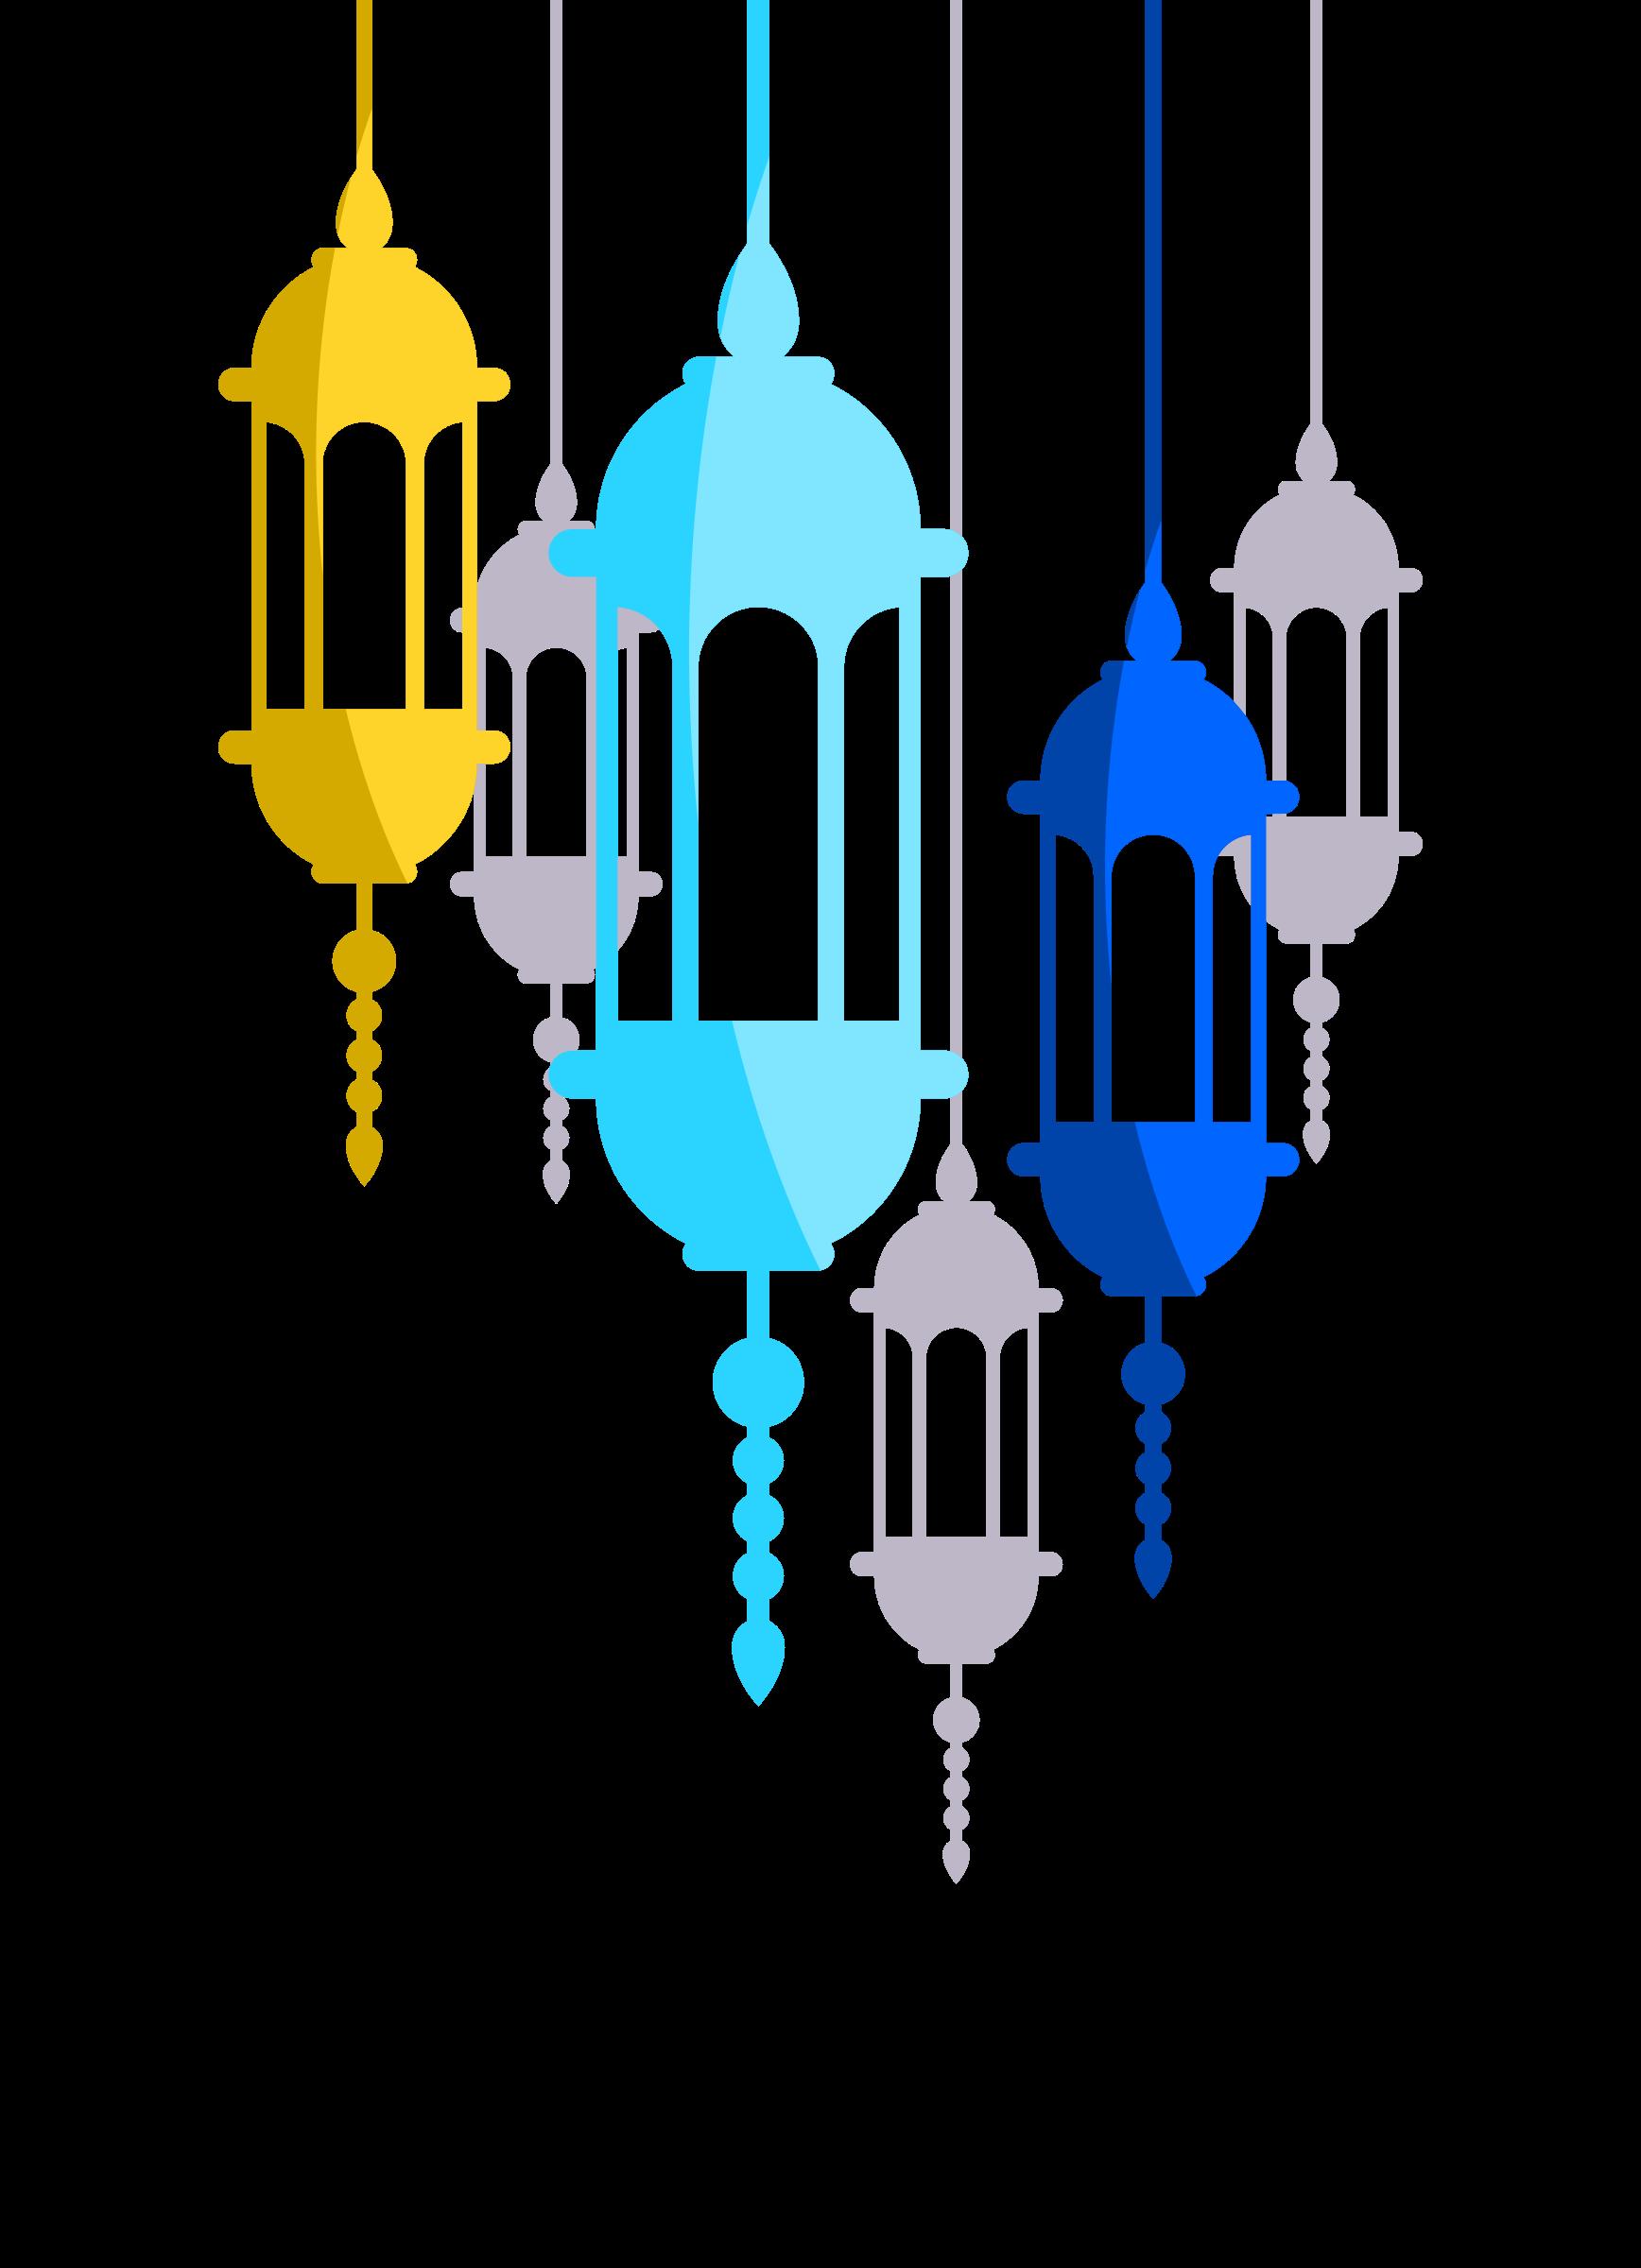 Lantern clipart islamic, Lantern islamic Transparent FREE.